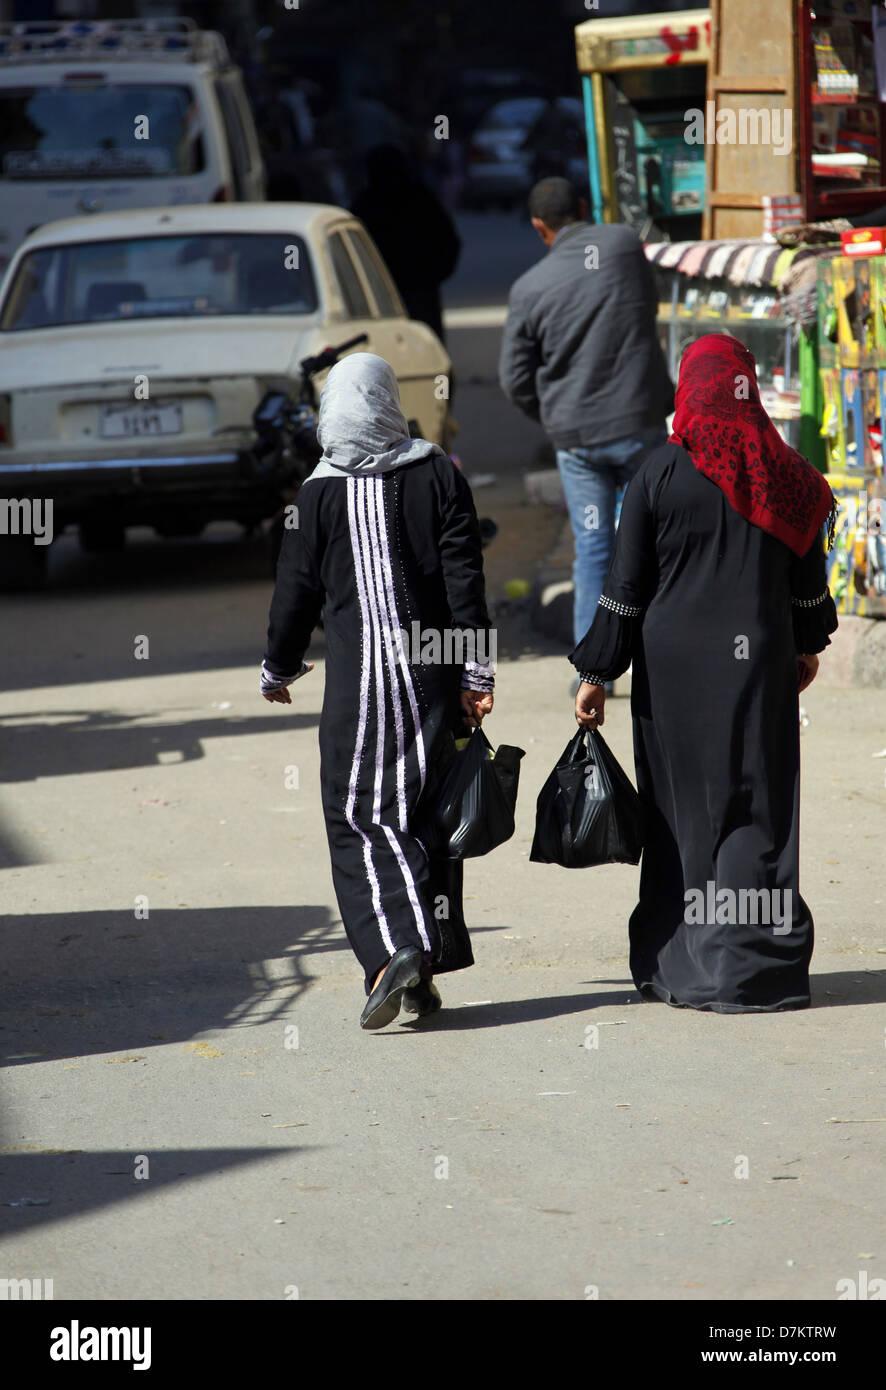 BACK VIEW OF MUSLIM WOMEN WALKING LUXOR EGYPT 13 January 2013 - Stock Image